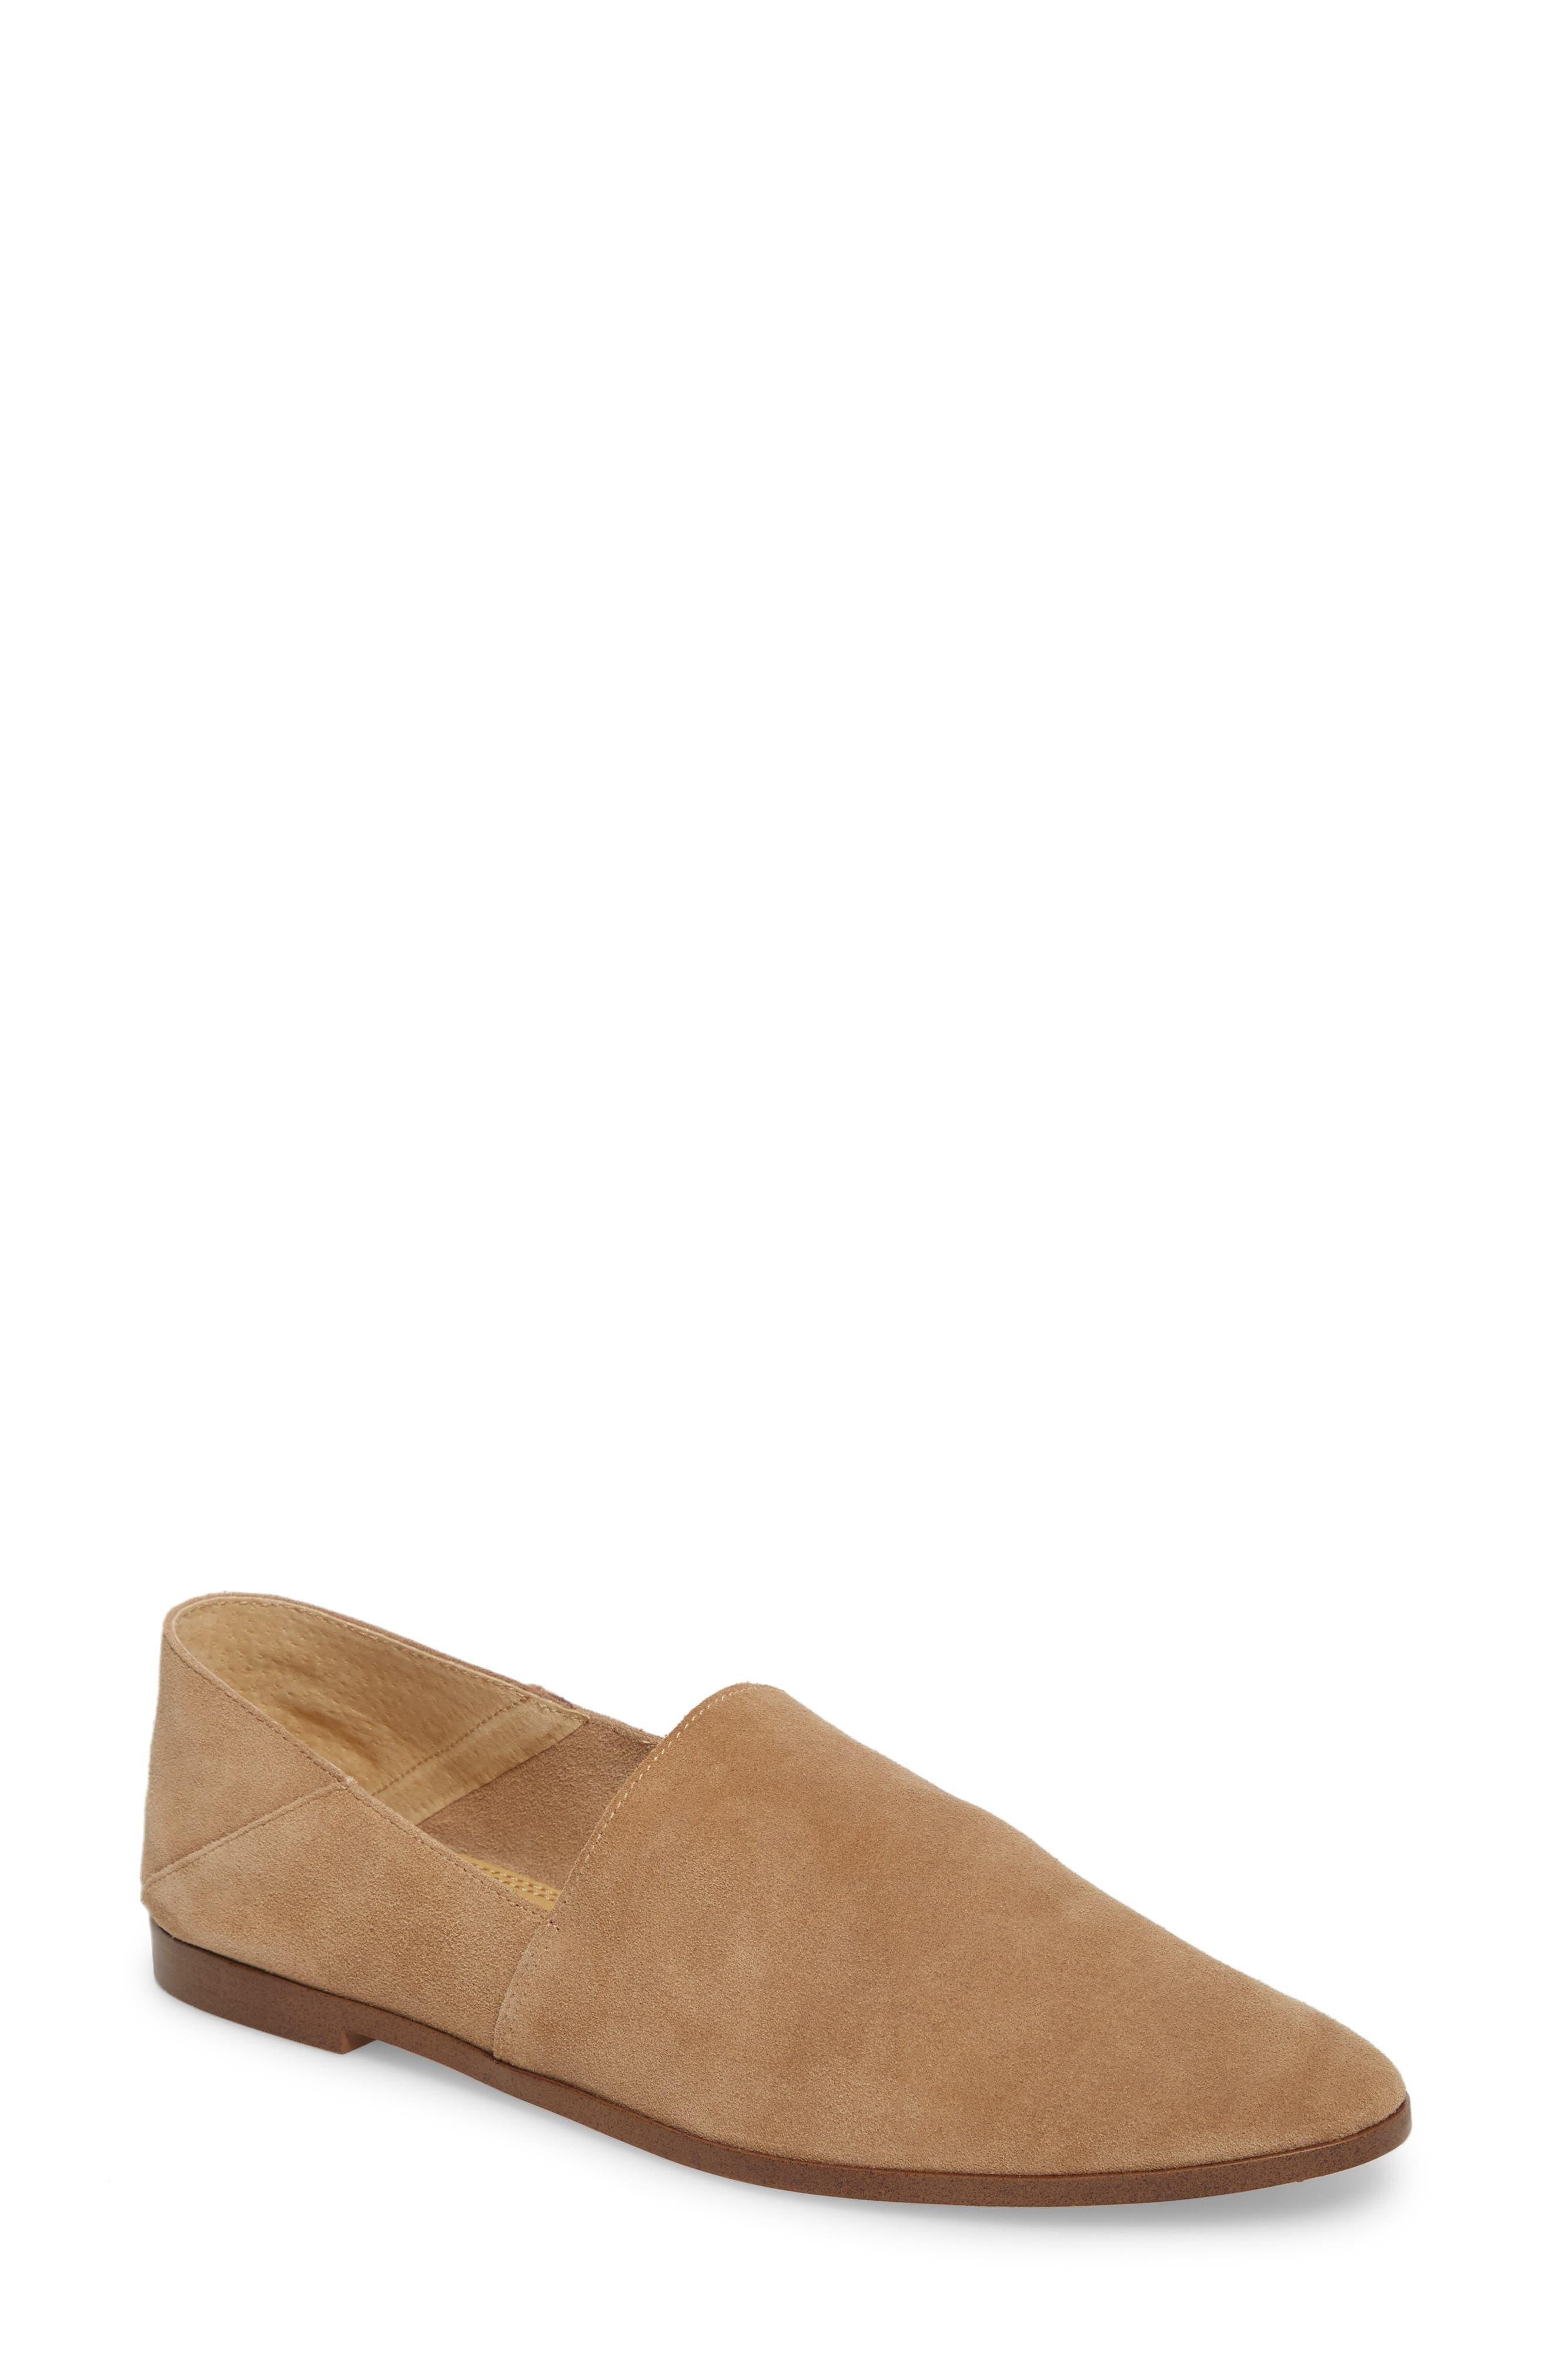 Babette Almond Toe Flat,                         Main,                         color, Light Taupe Suede